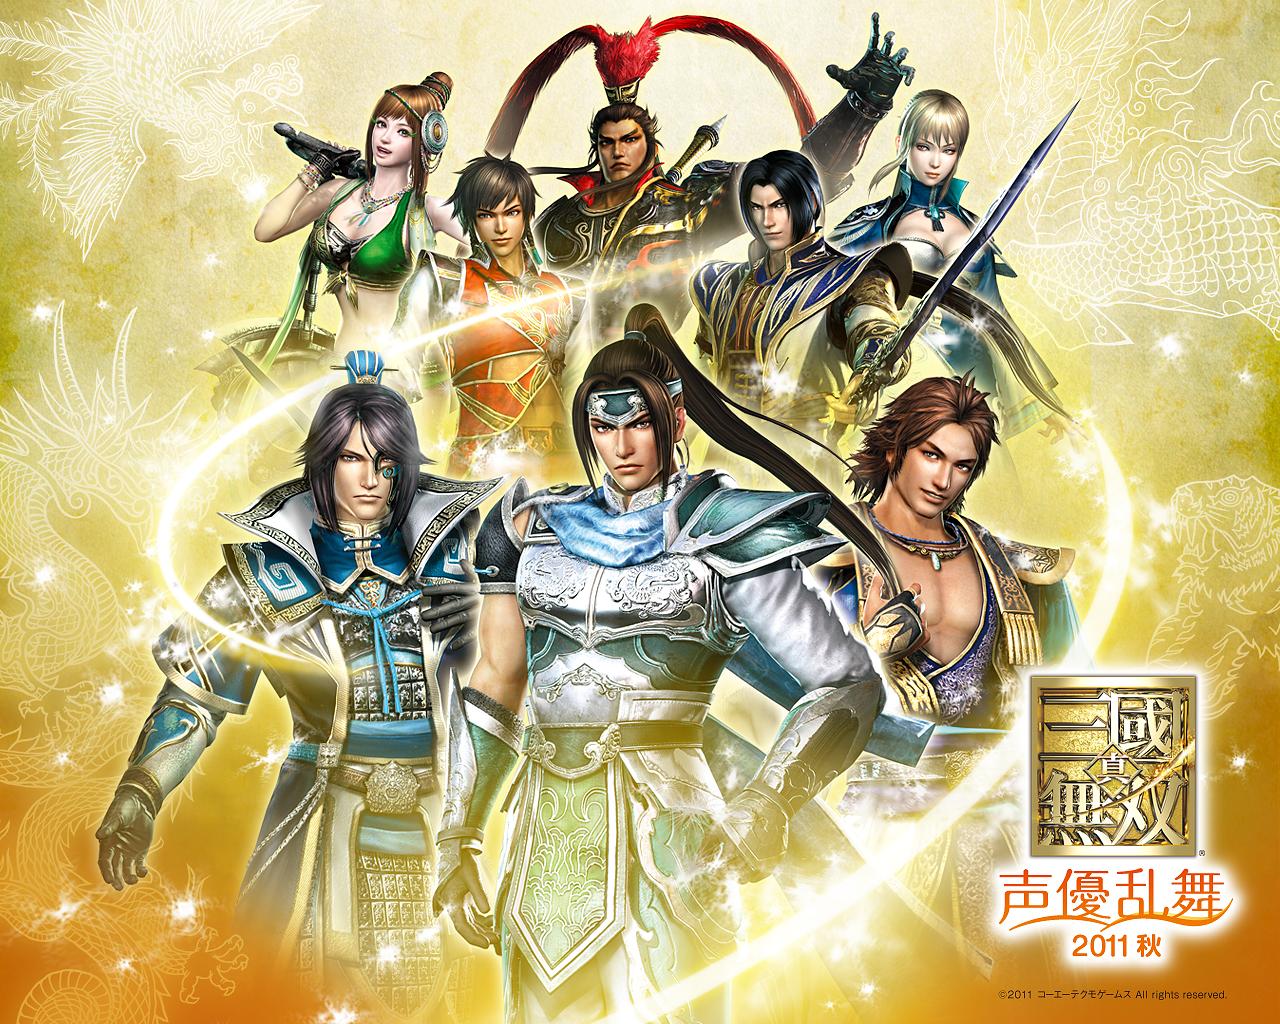 http://www.gamecity.ne.jp/media/event/2011/smusou/Ranbu_2011Aut_1280_1024.jpg